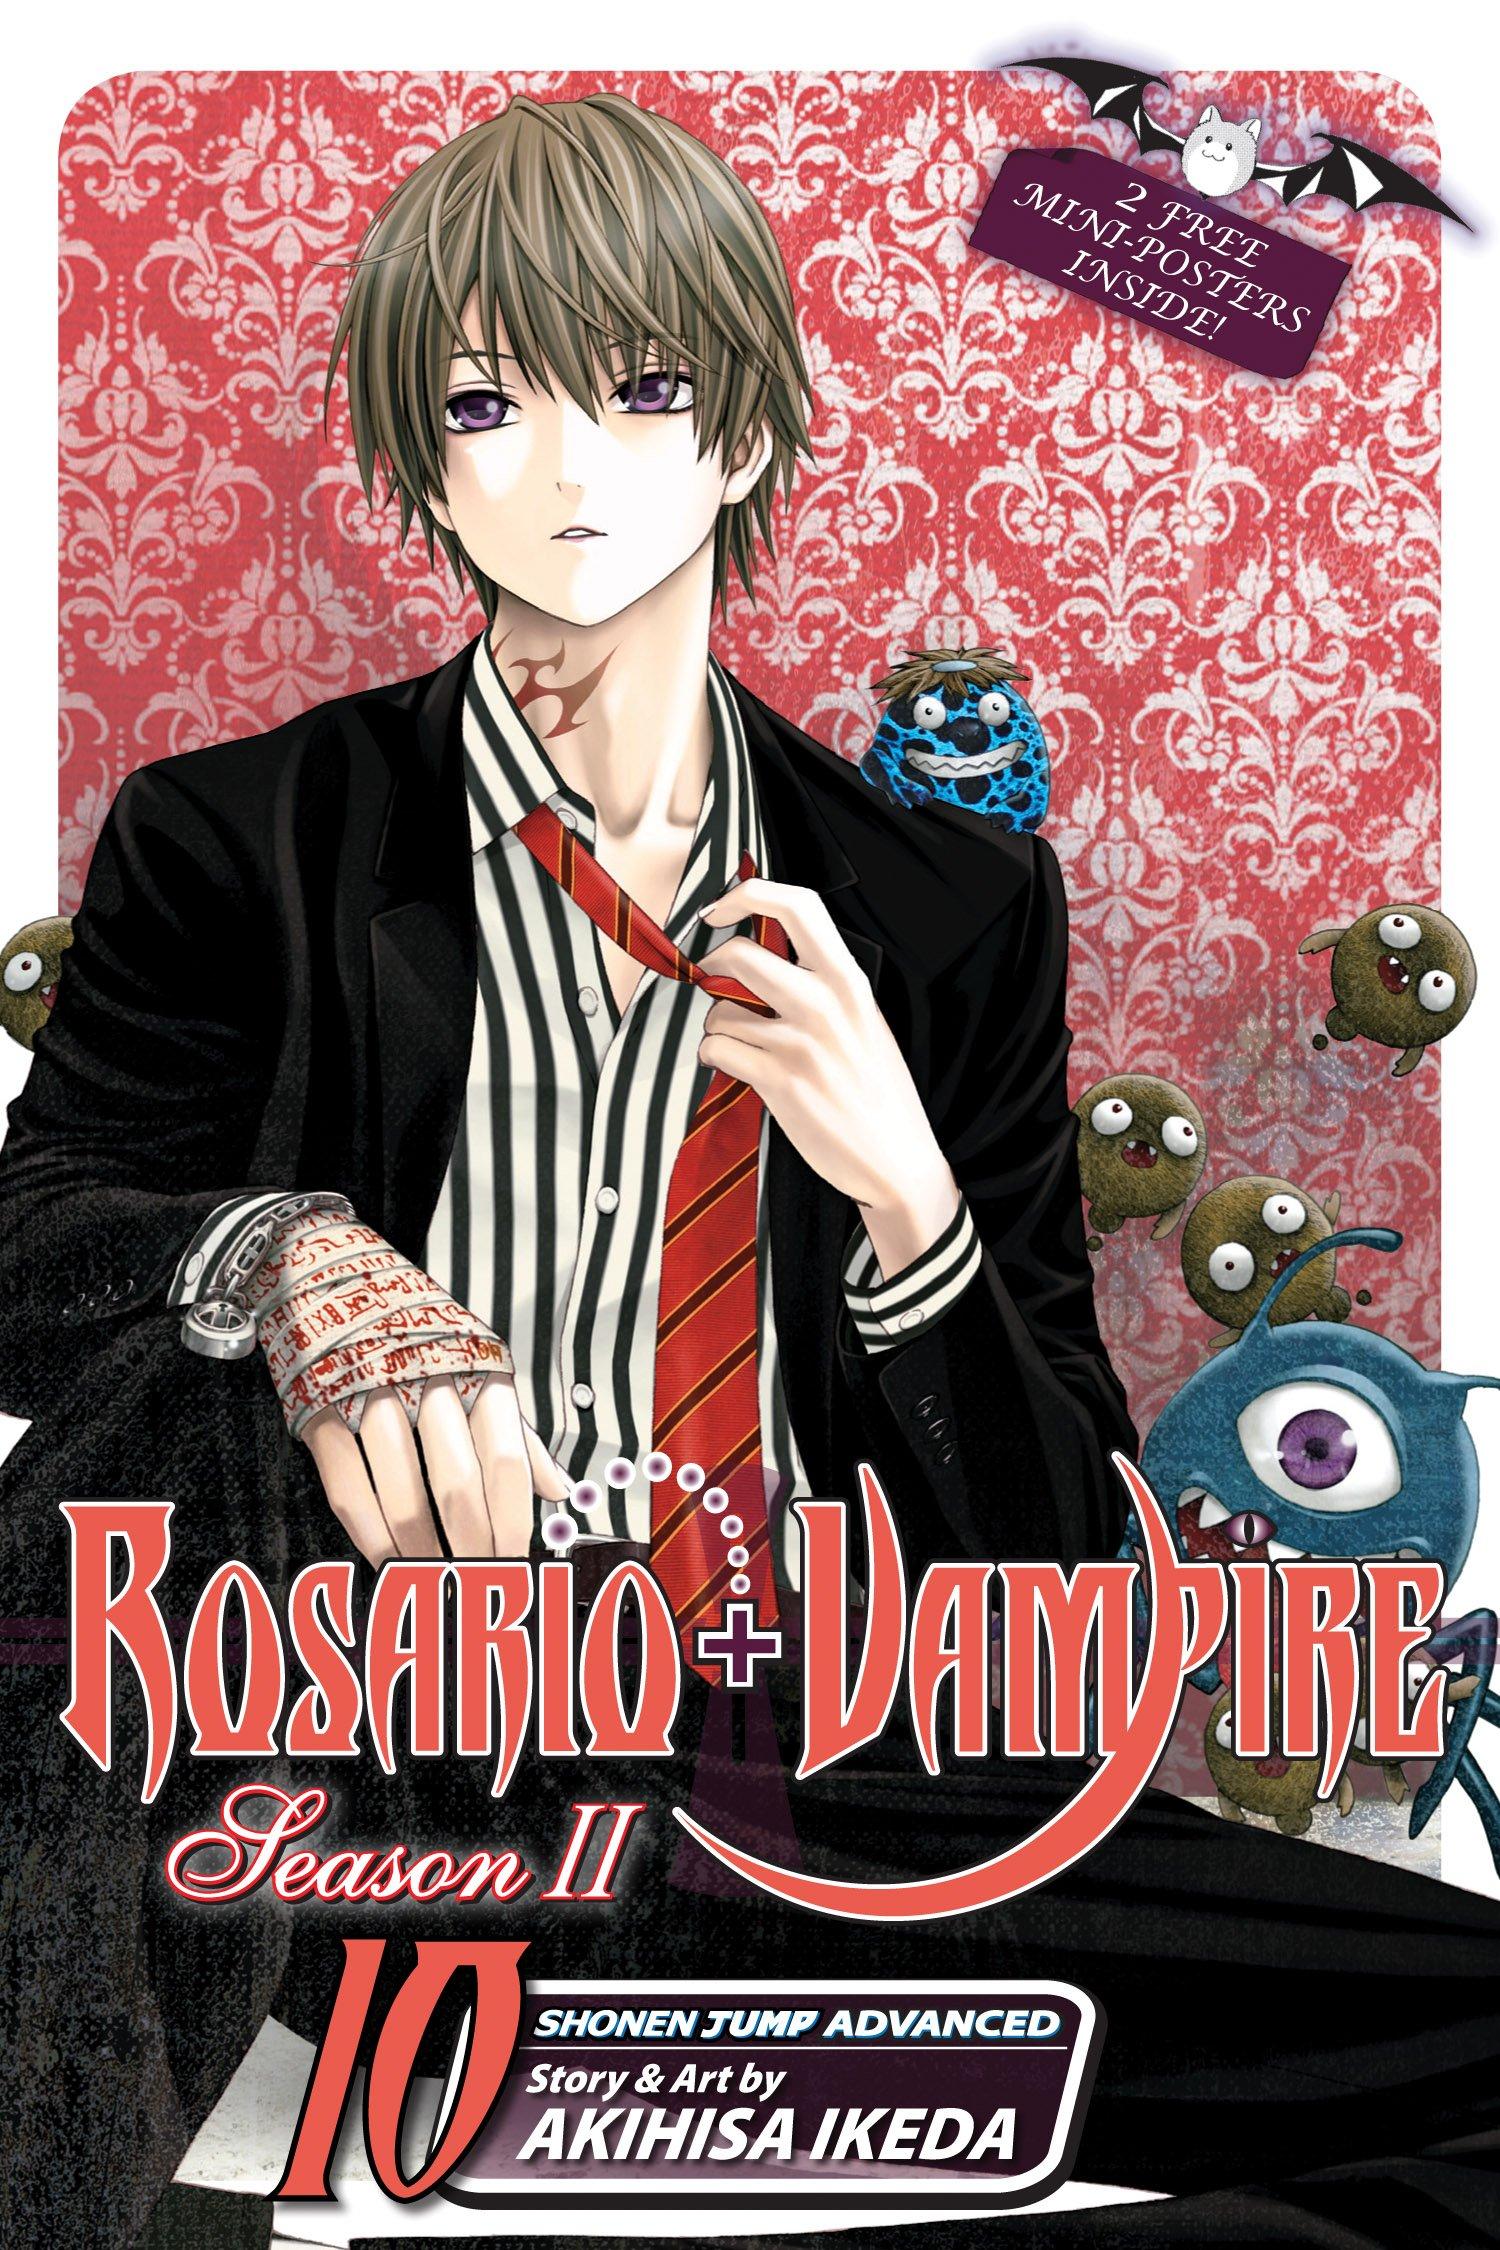 rosario vampire season ii vol 10 akihisa ikeda 9781421548791